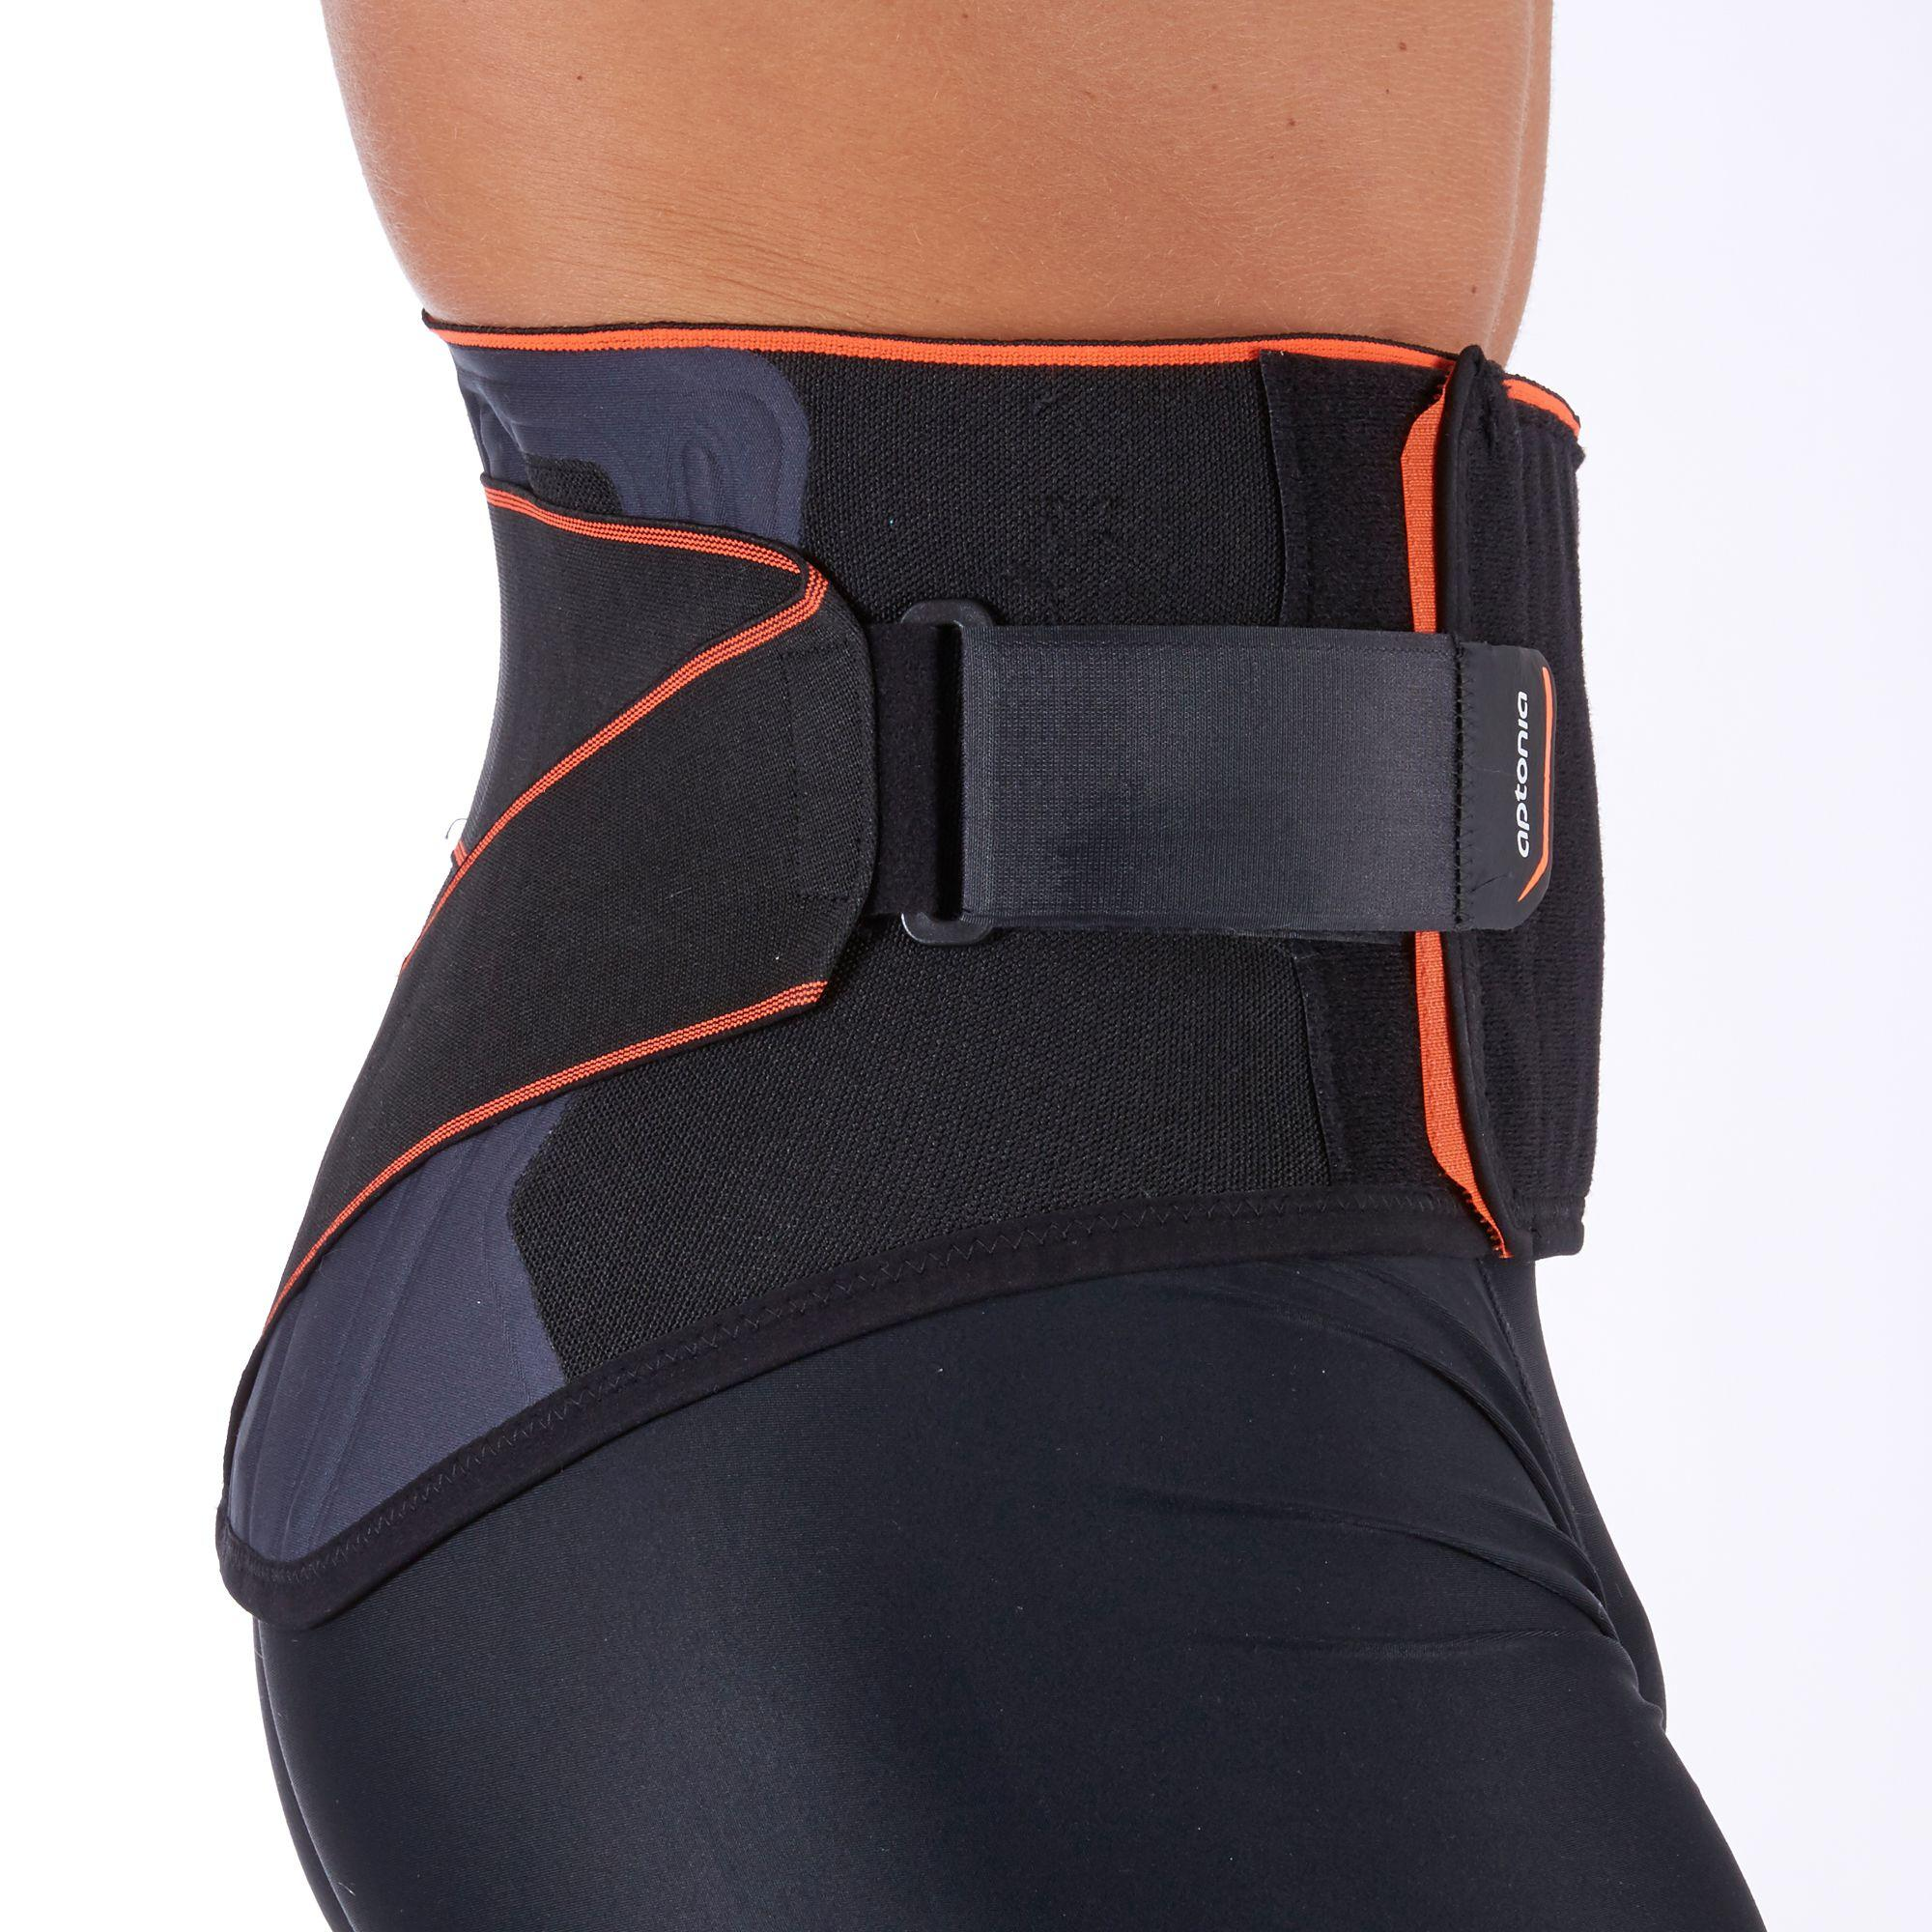 Mid 500 Men's/Women's Lumbar Brace - Black